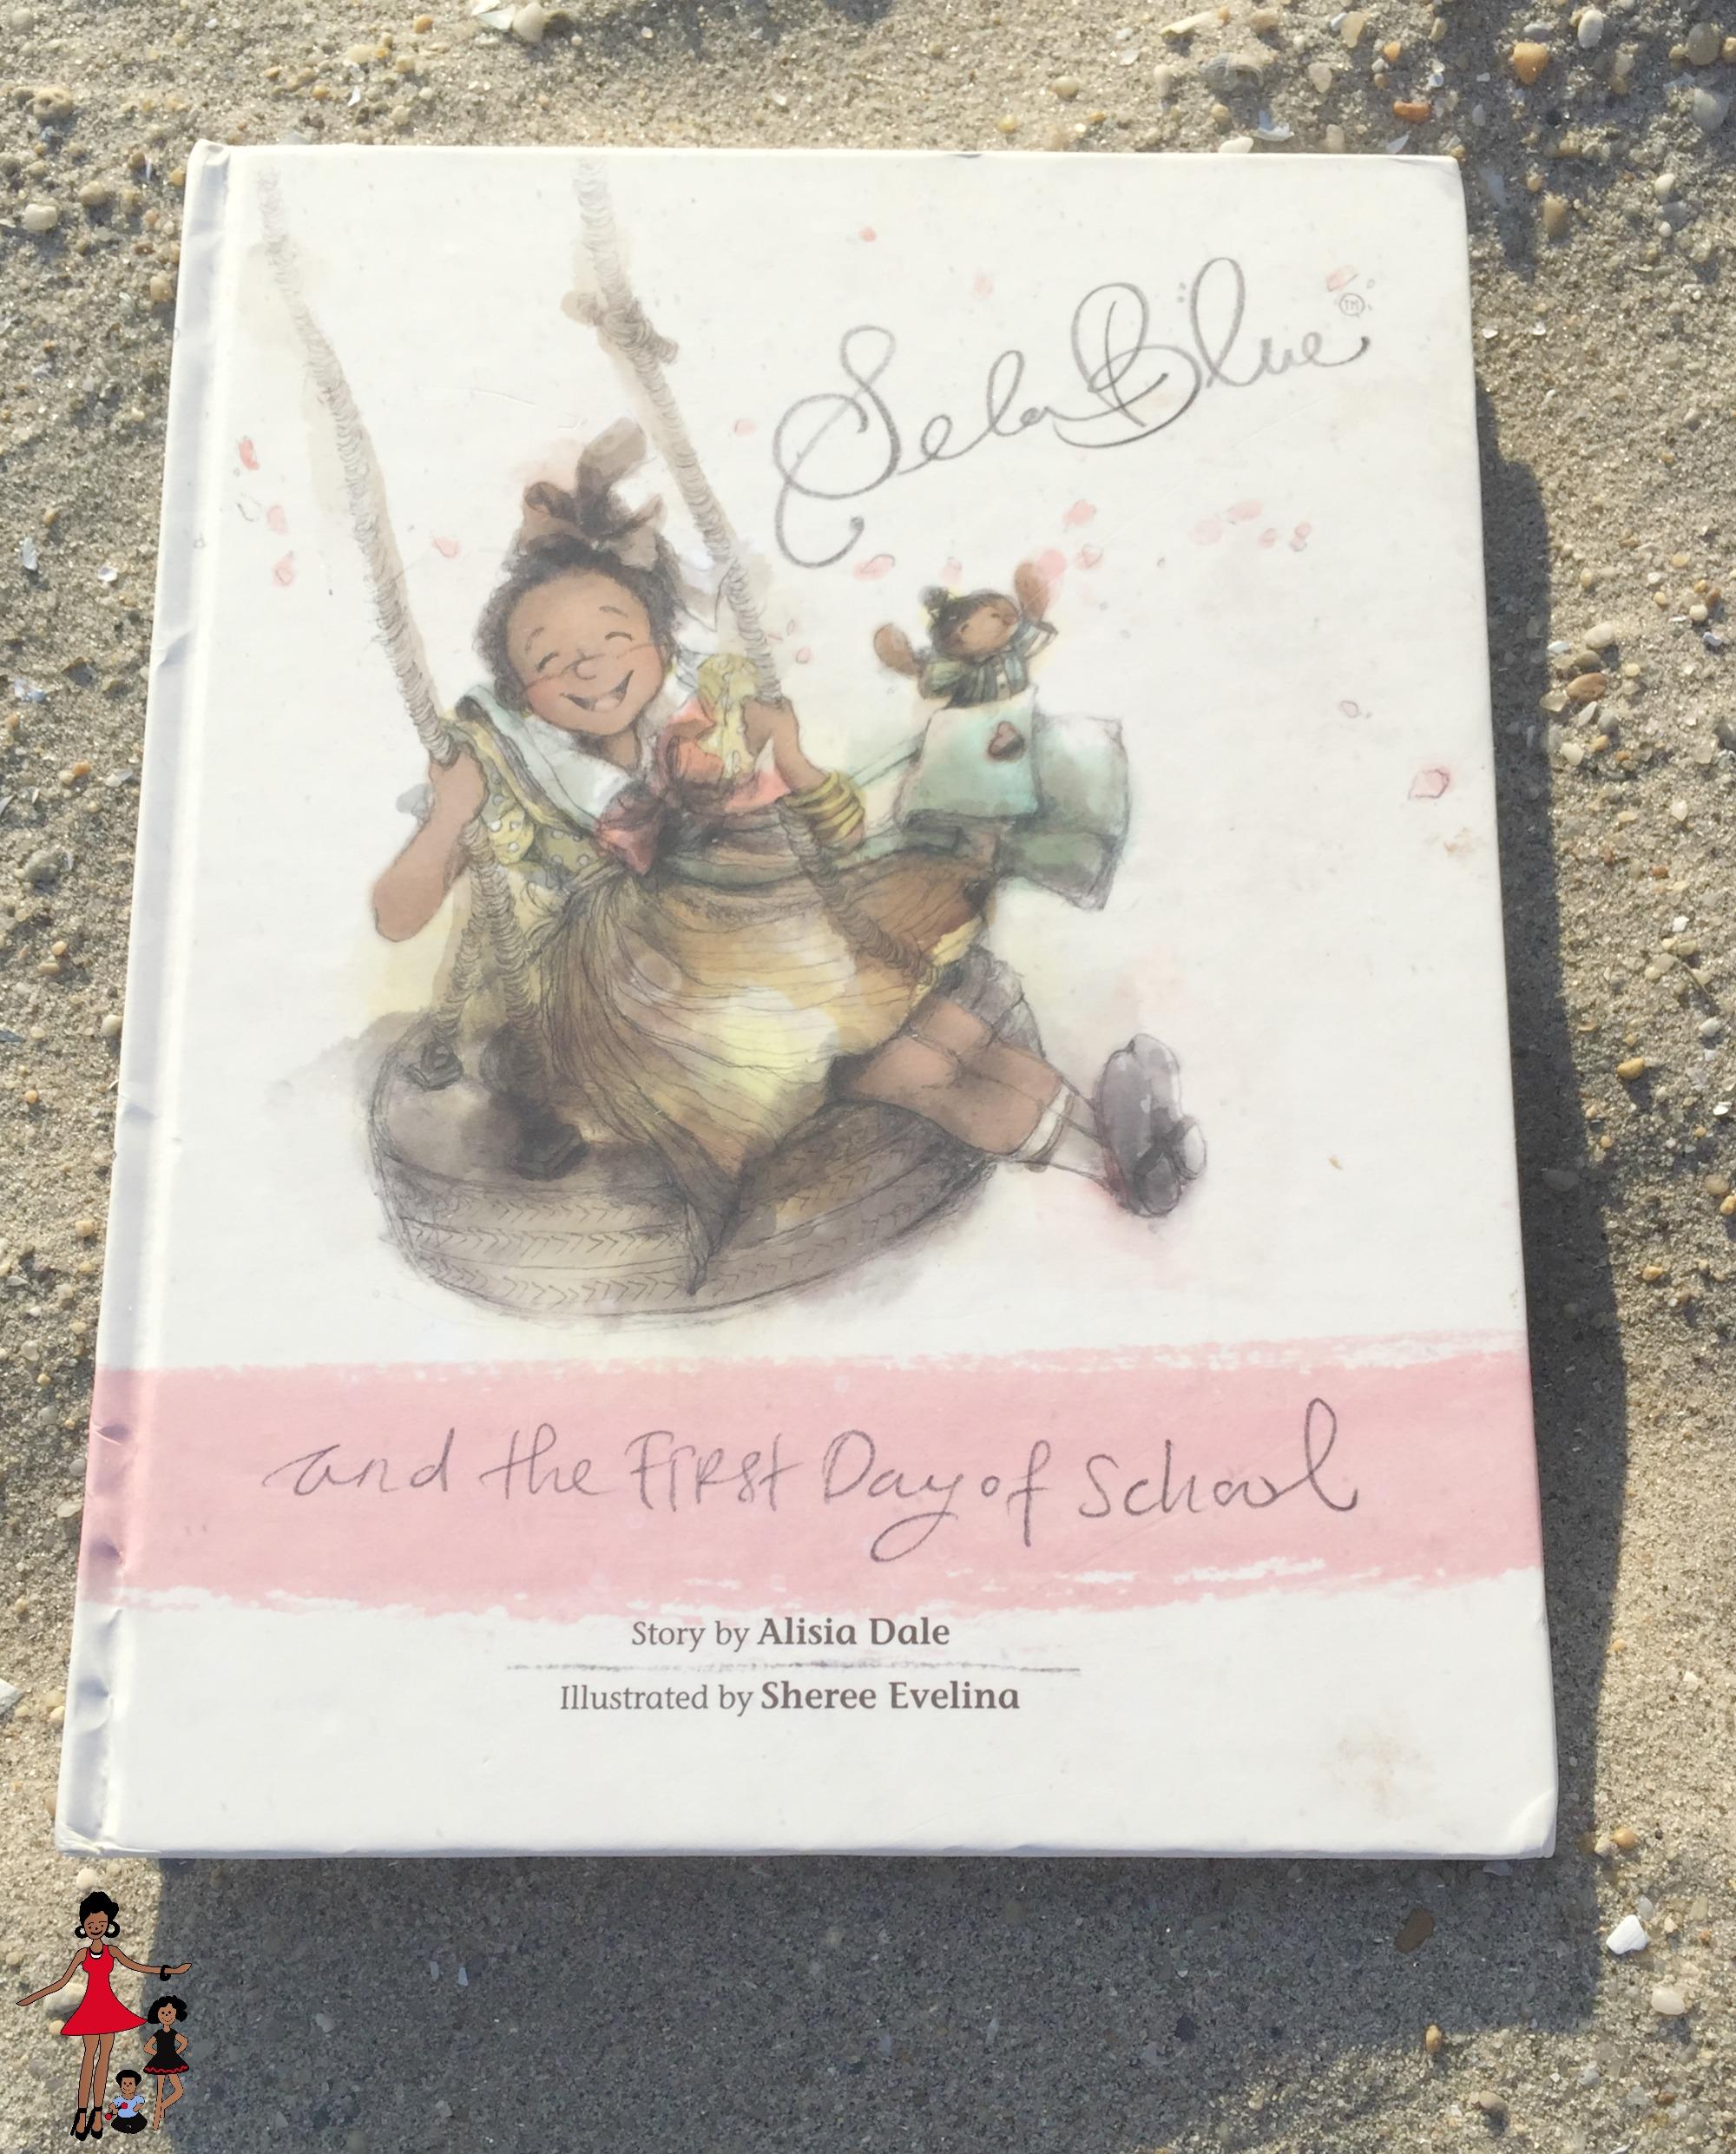 sela-blue-children-book